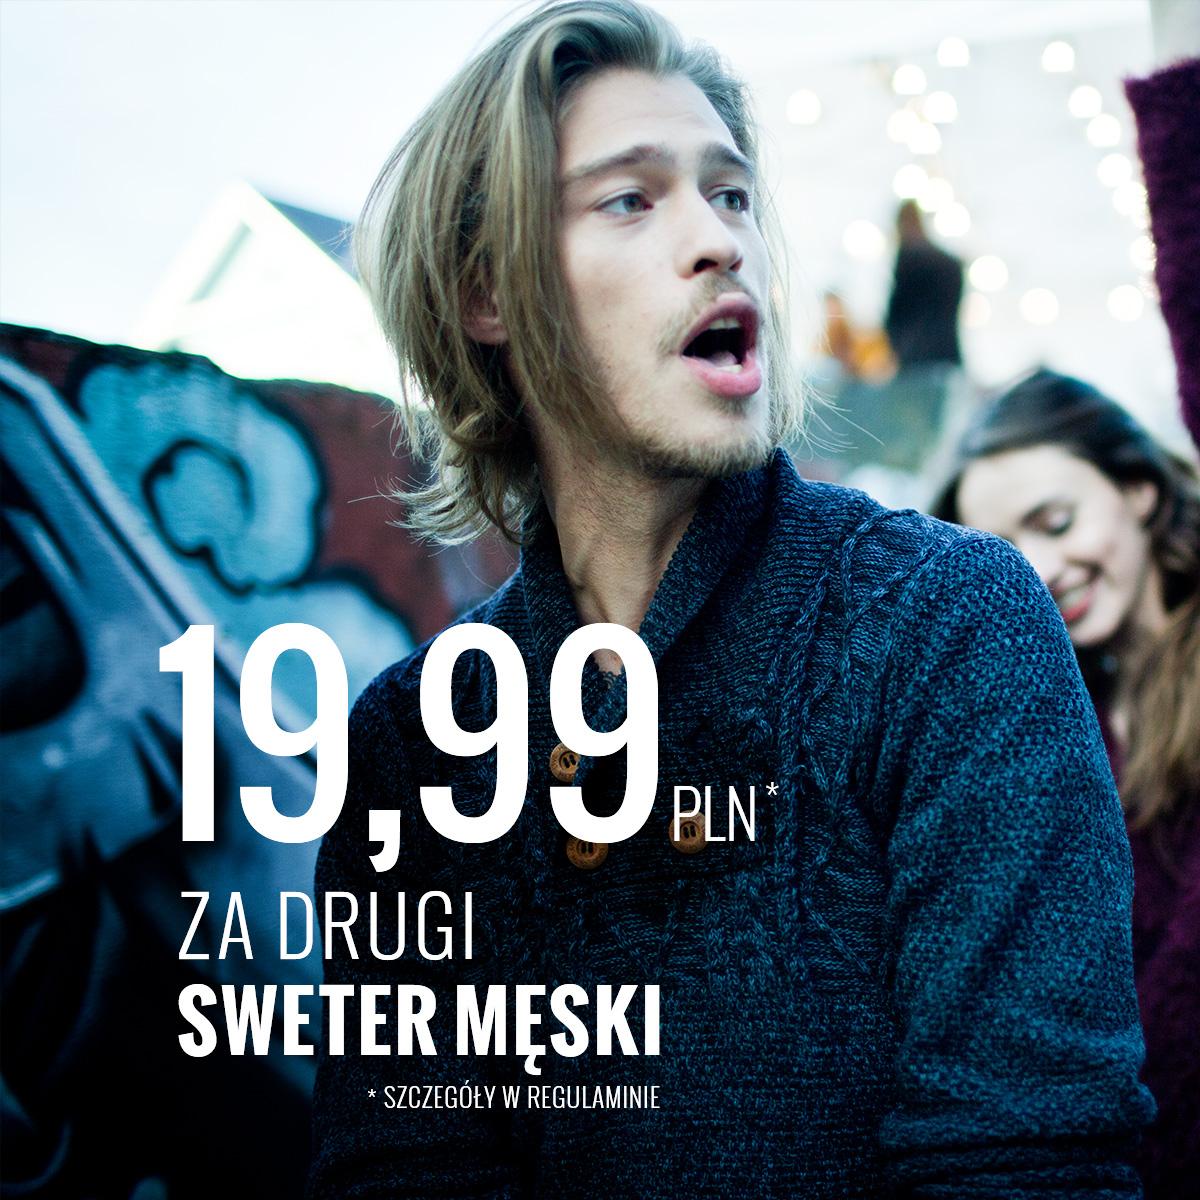 House 19 99 Z Za Drugi Sweter M Ski